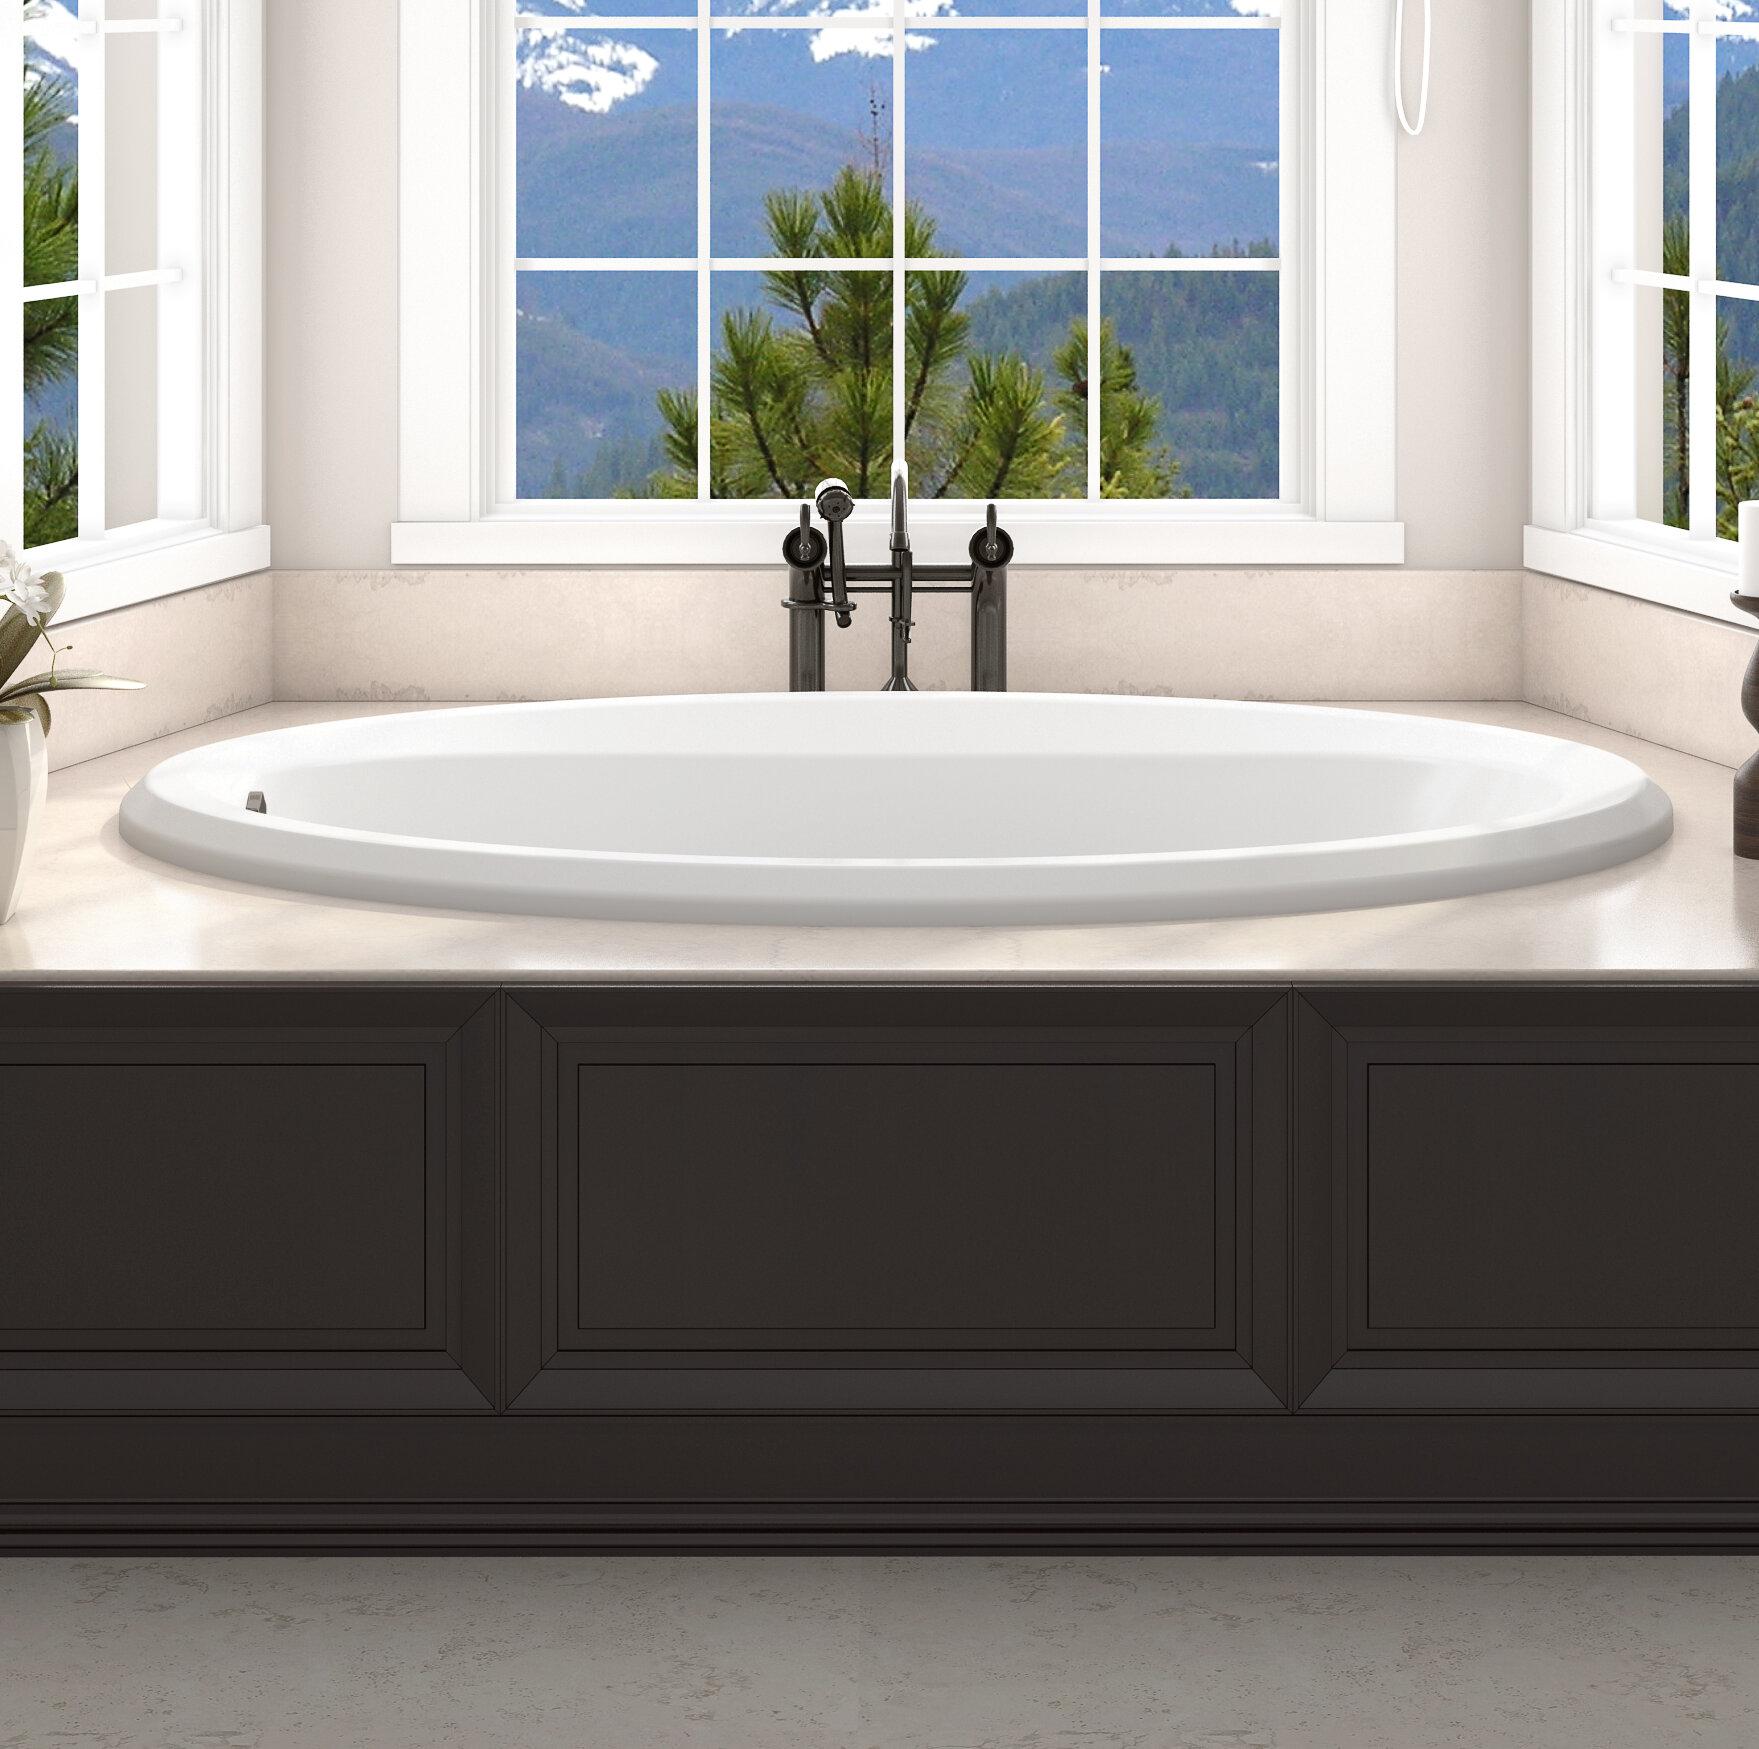 Jacuzzi Whirlpool Jacuzzi.Signature 60 X 36 Drop In Whirlpool Bathtub